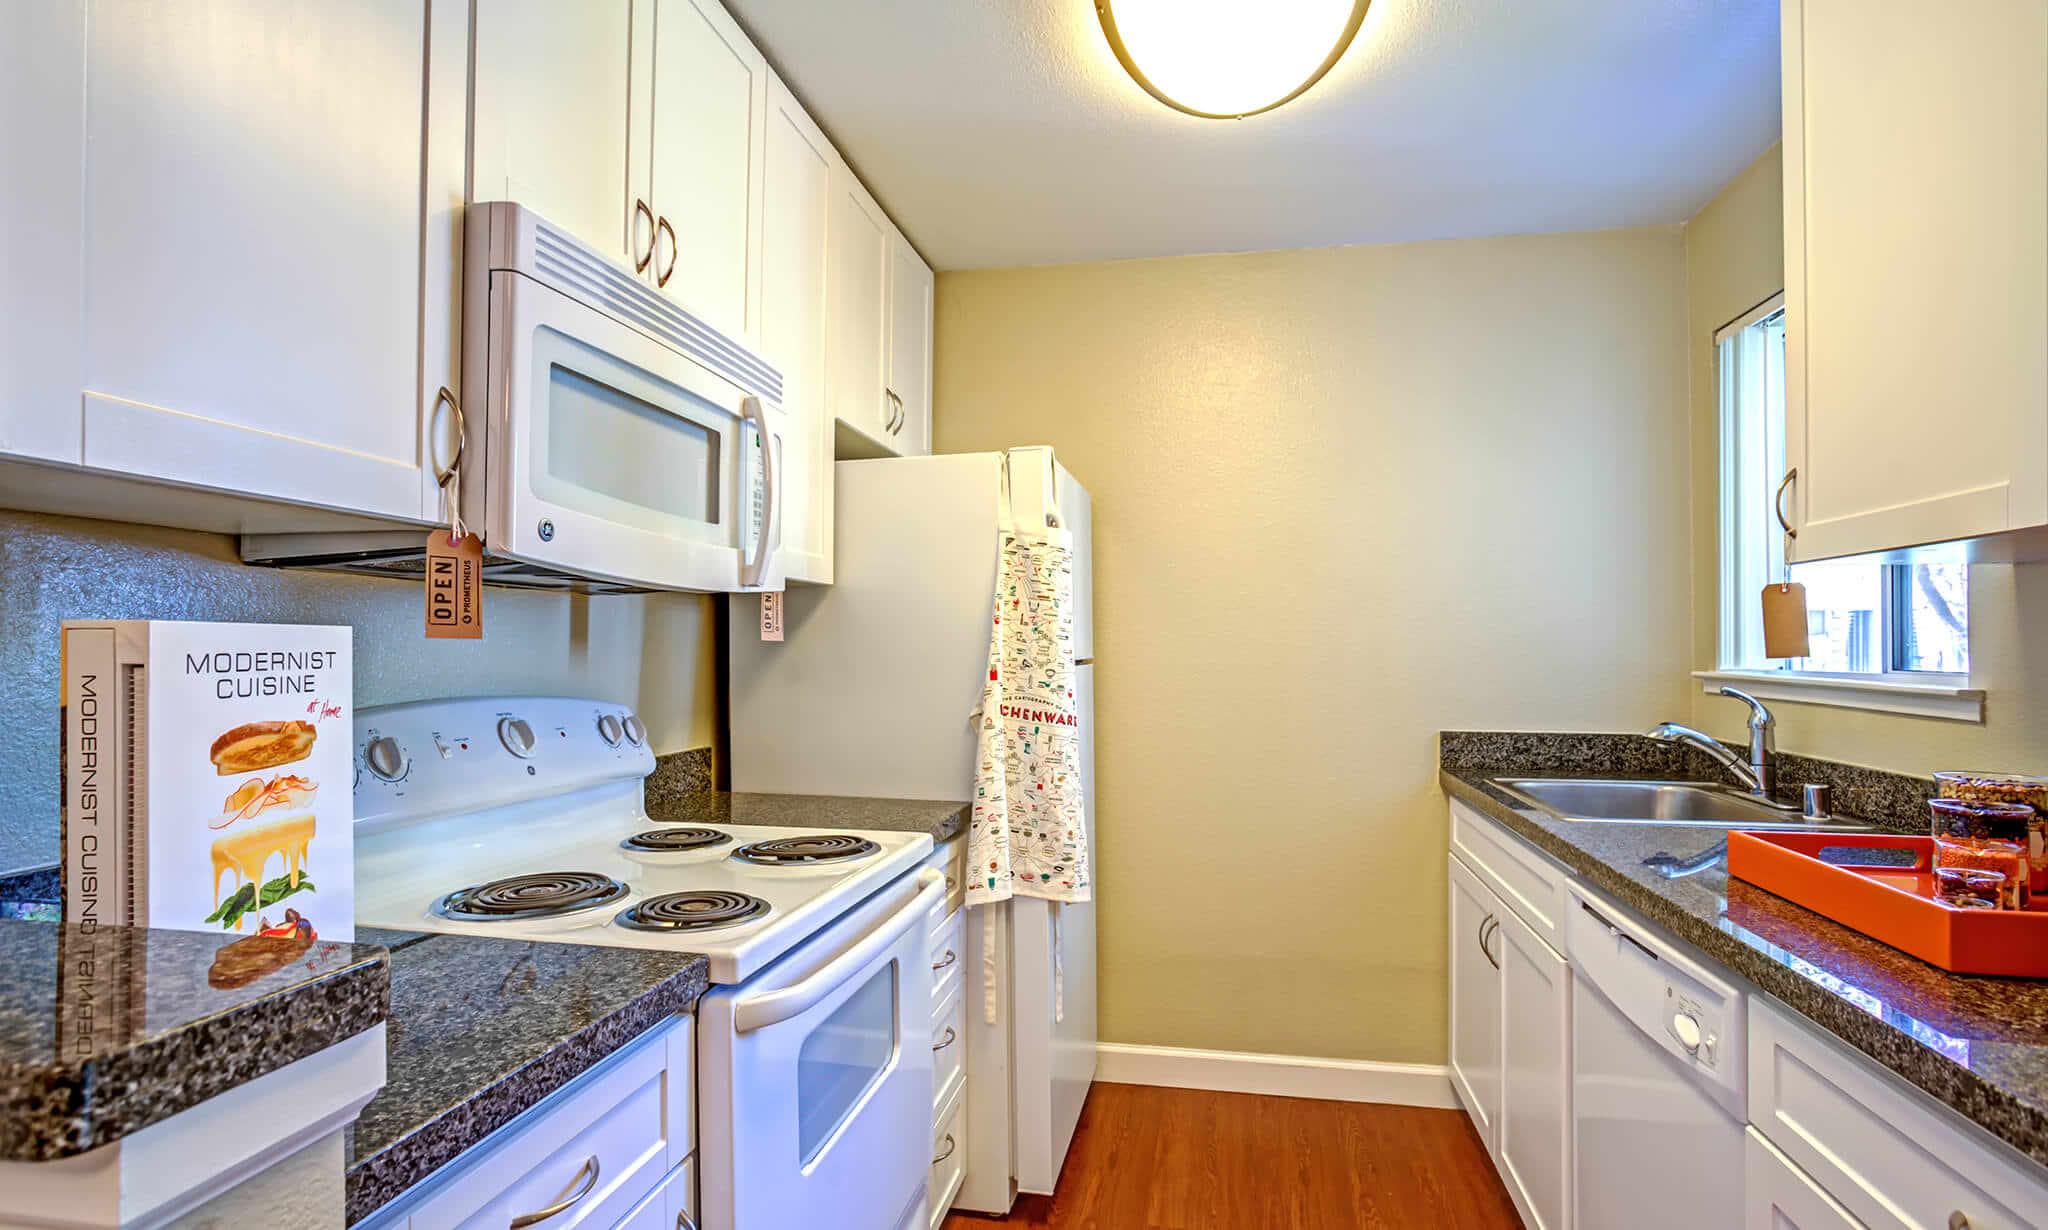 Timberleaf Apartments apartments in Santa Clara CA to rent photo 8